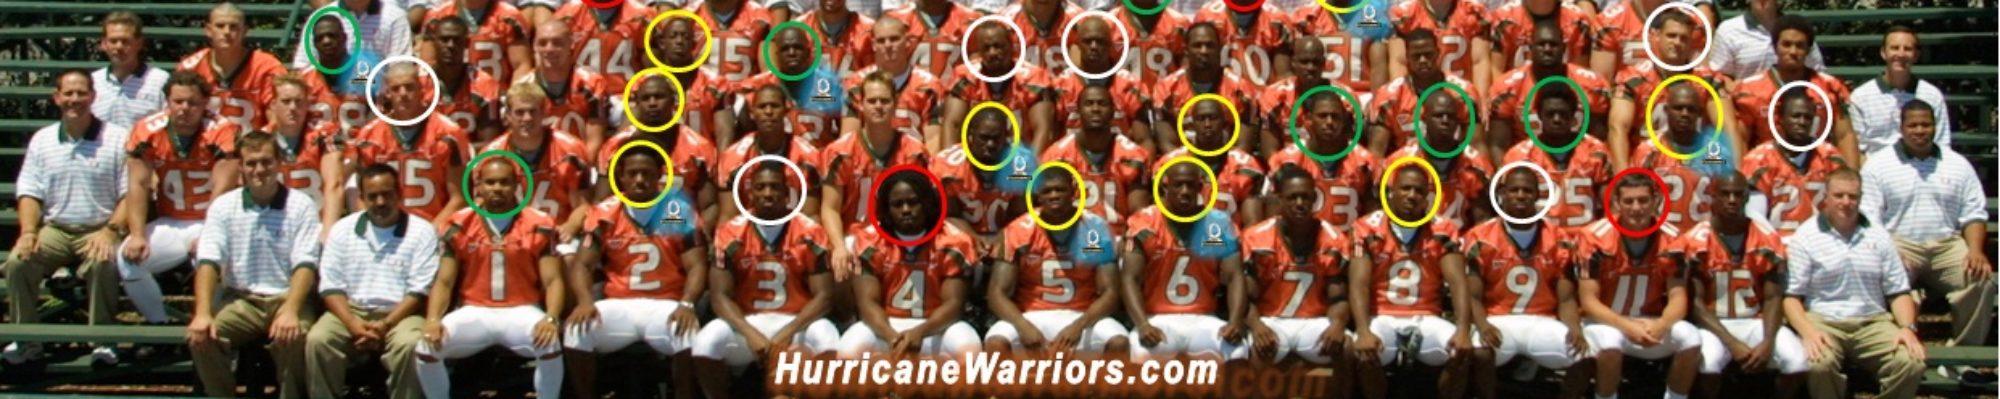 Hurricane Warriors